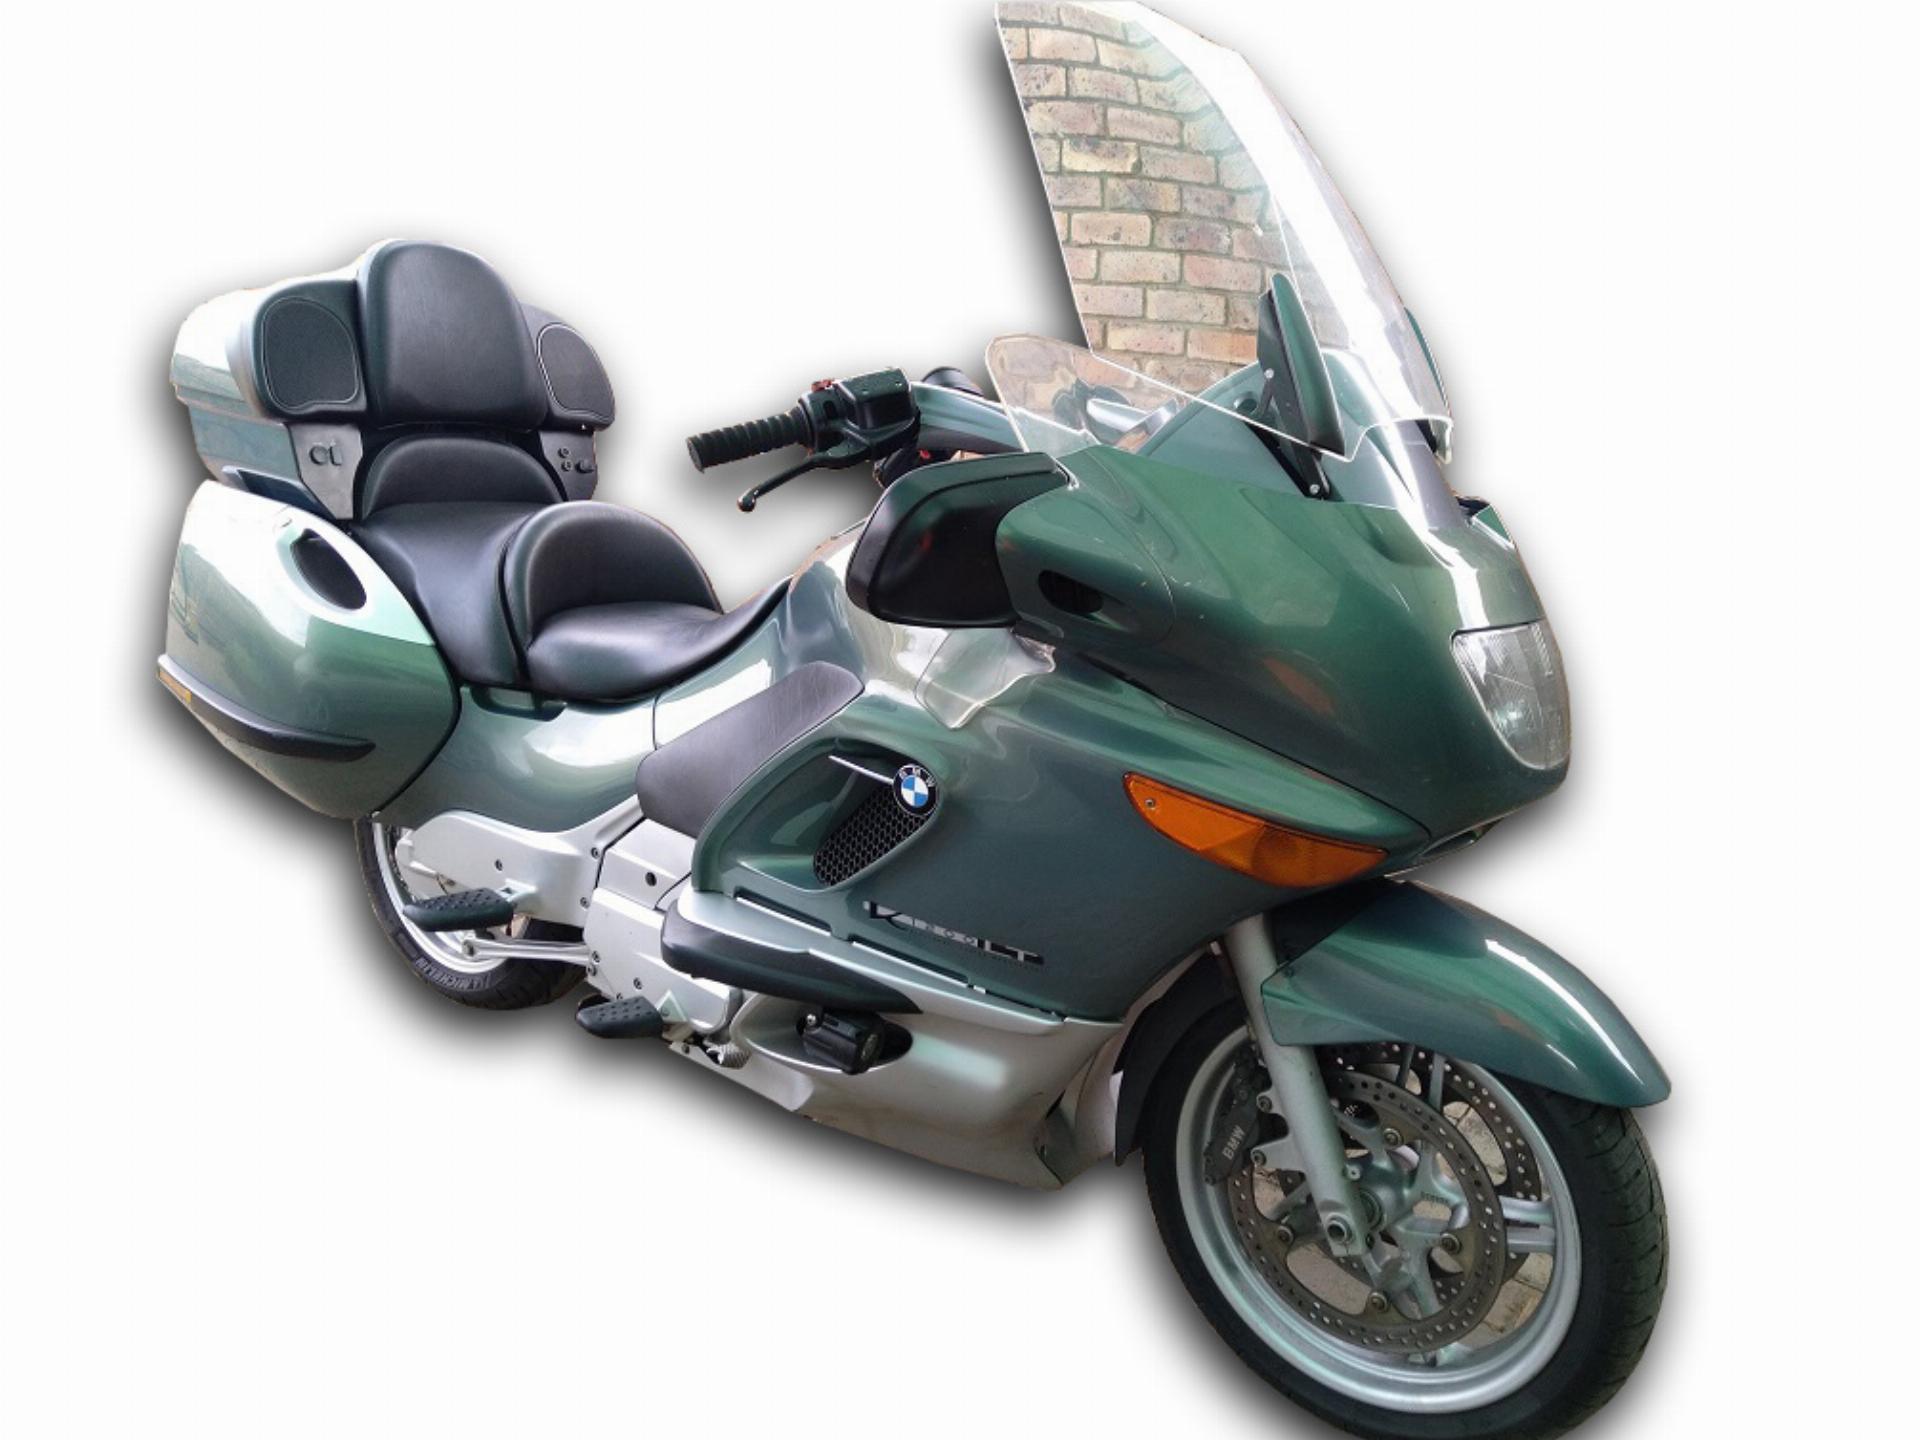 BMW Motorcycles R 1200 GS K1200LT